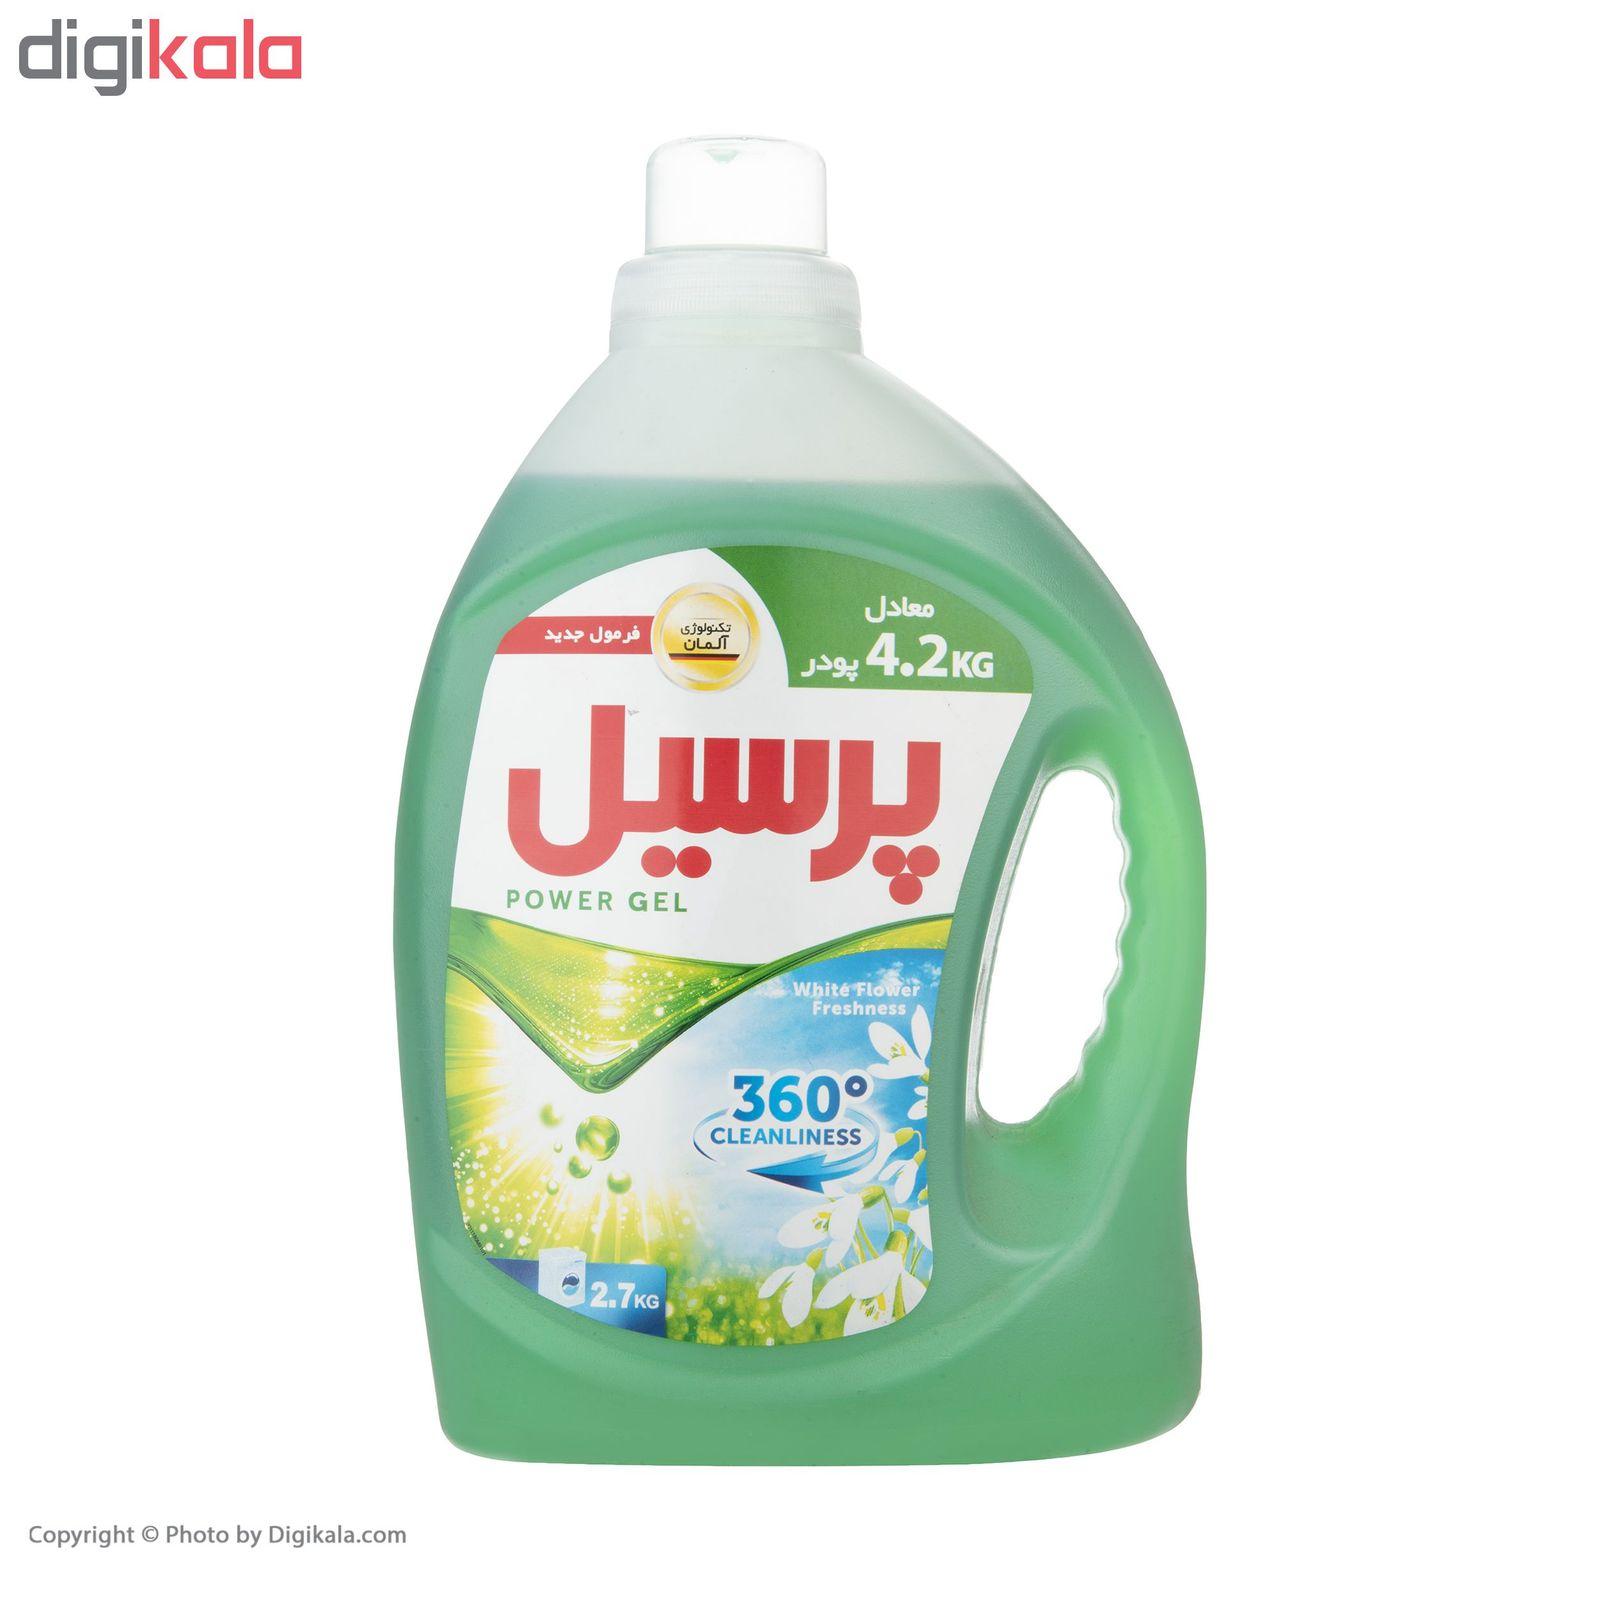 مایع ماشین لباسشویی پرسیل مدل 360Degree Cleanliness مقدار 2.7 کیلوگرم main 1 2